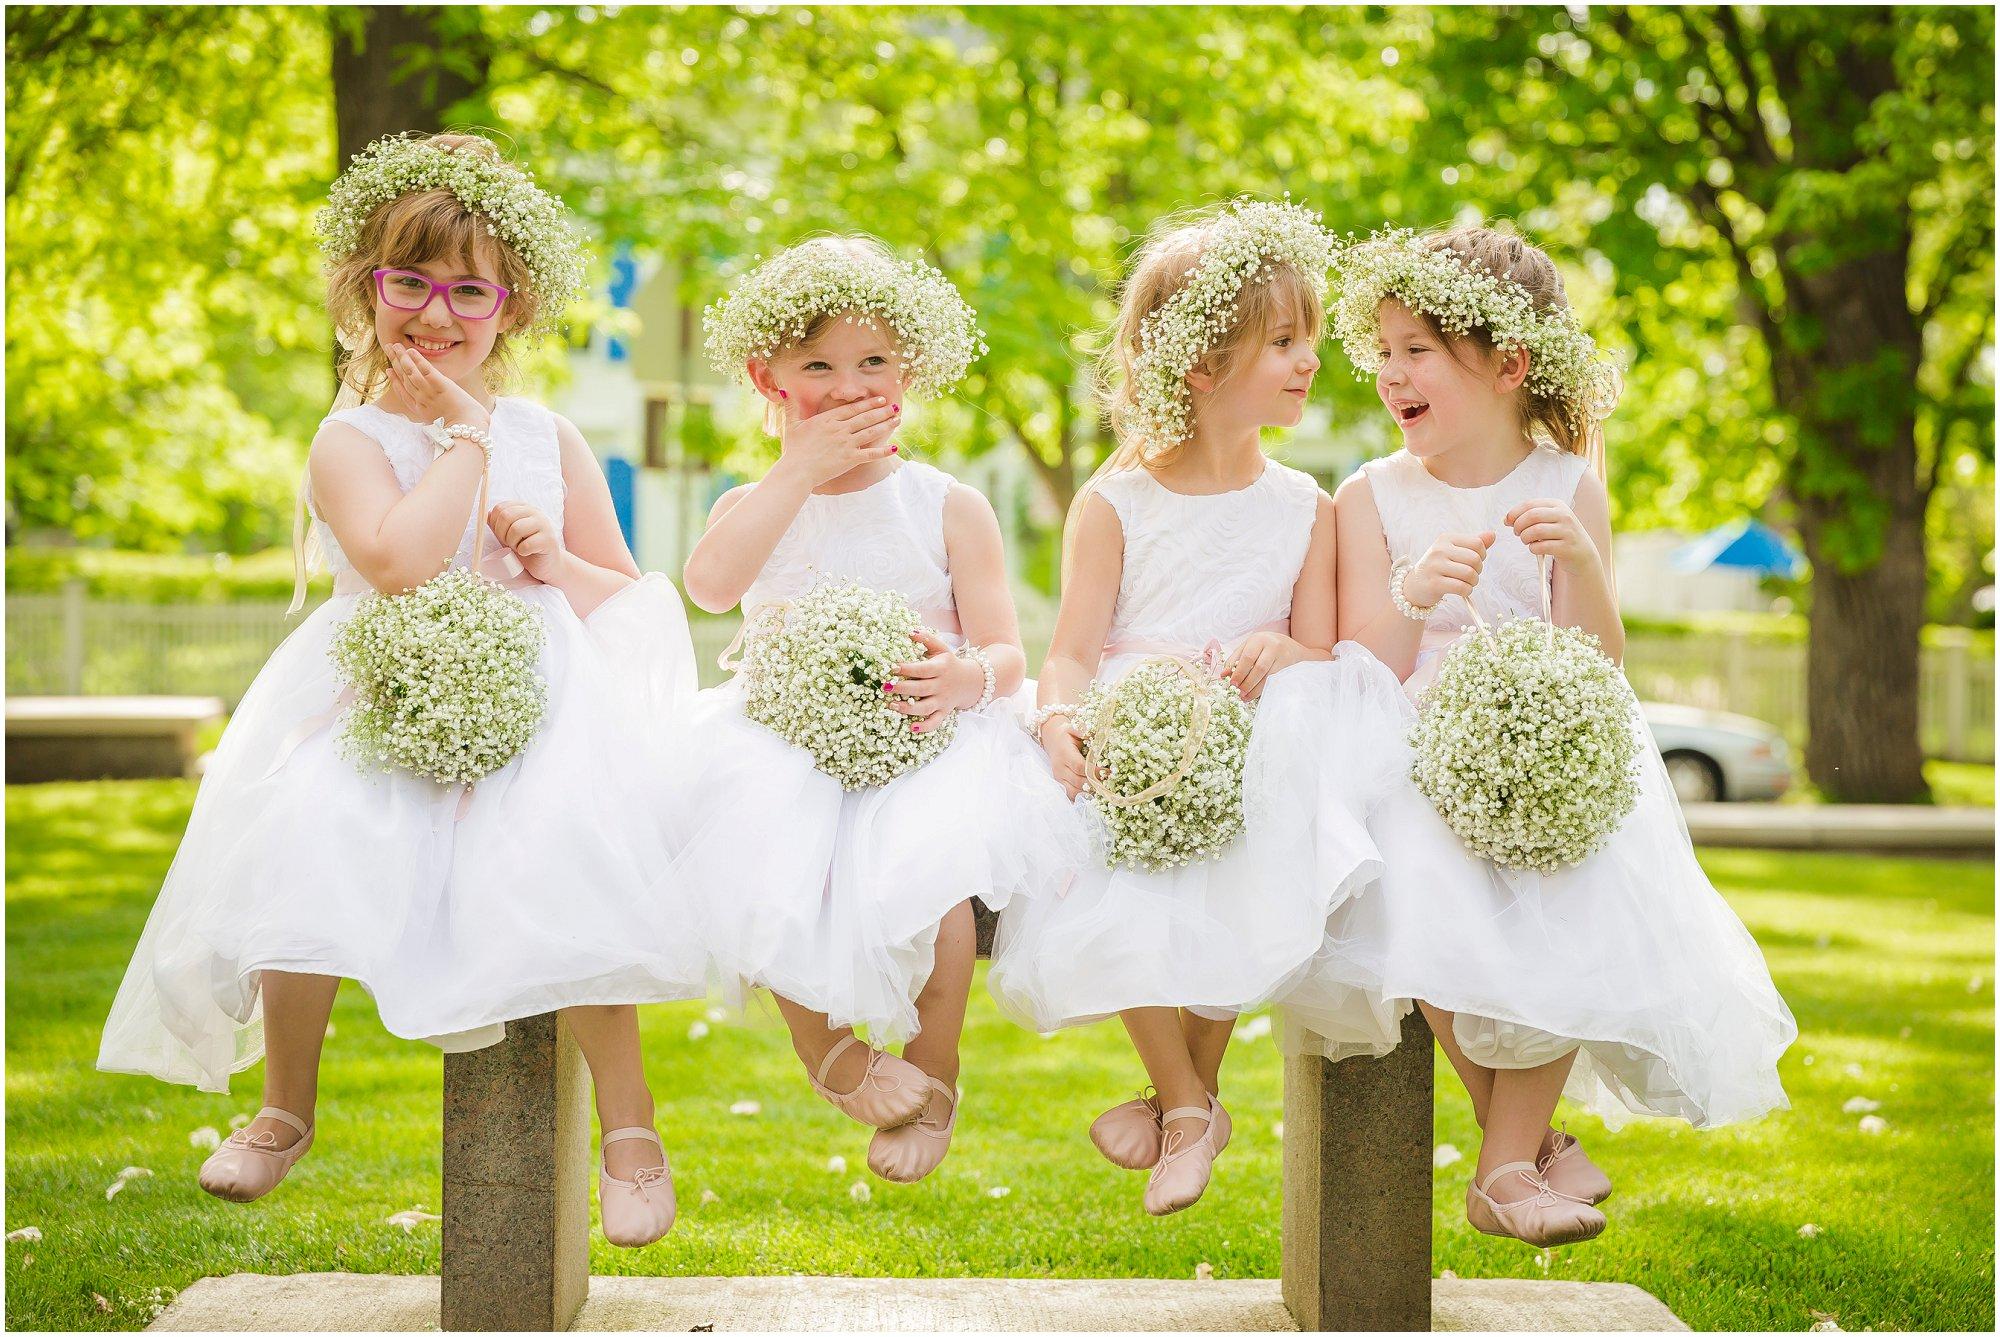 Plymouth_michigan_wedding_photographer_0422.jpg